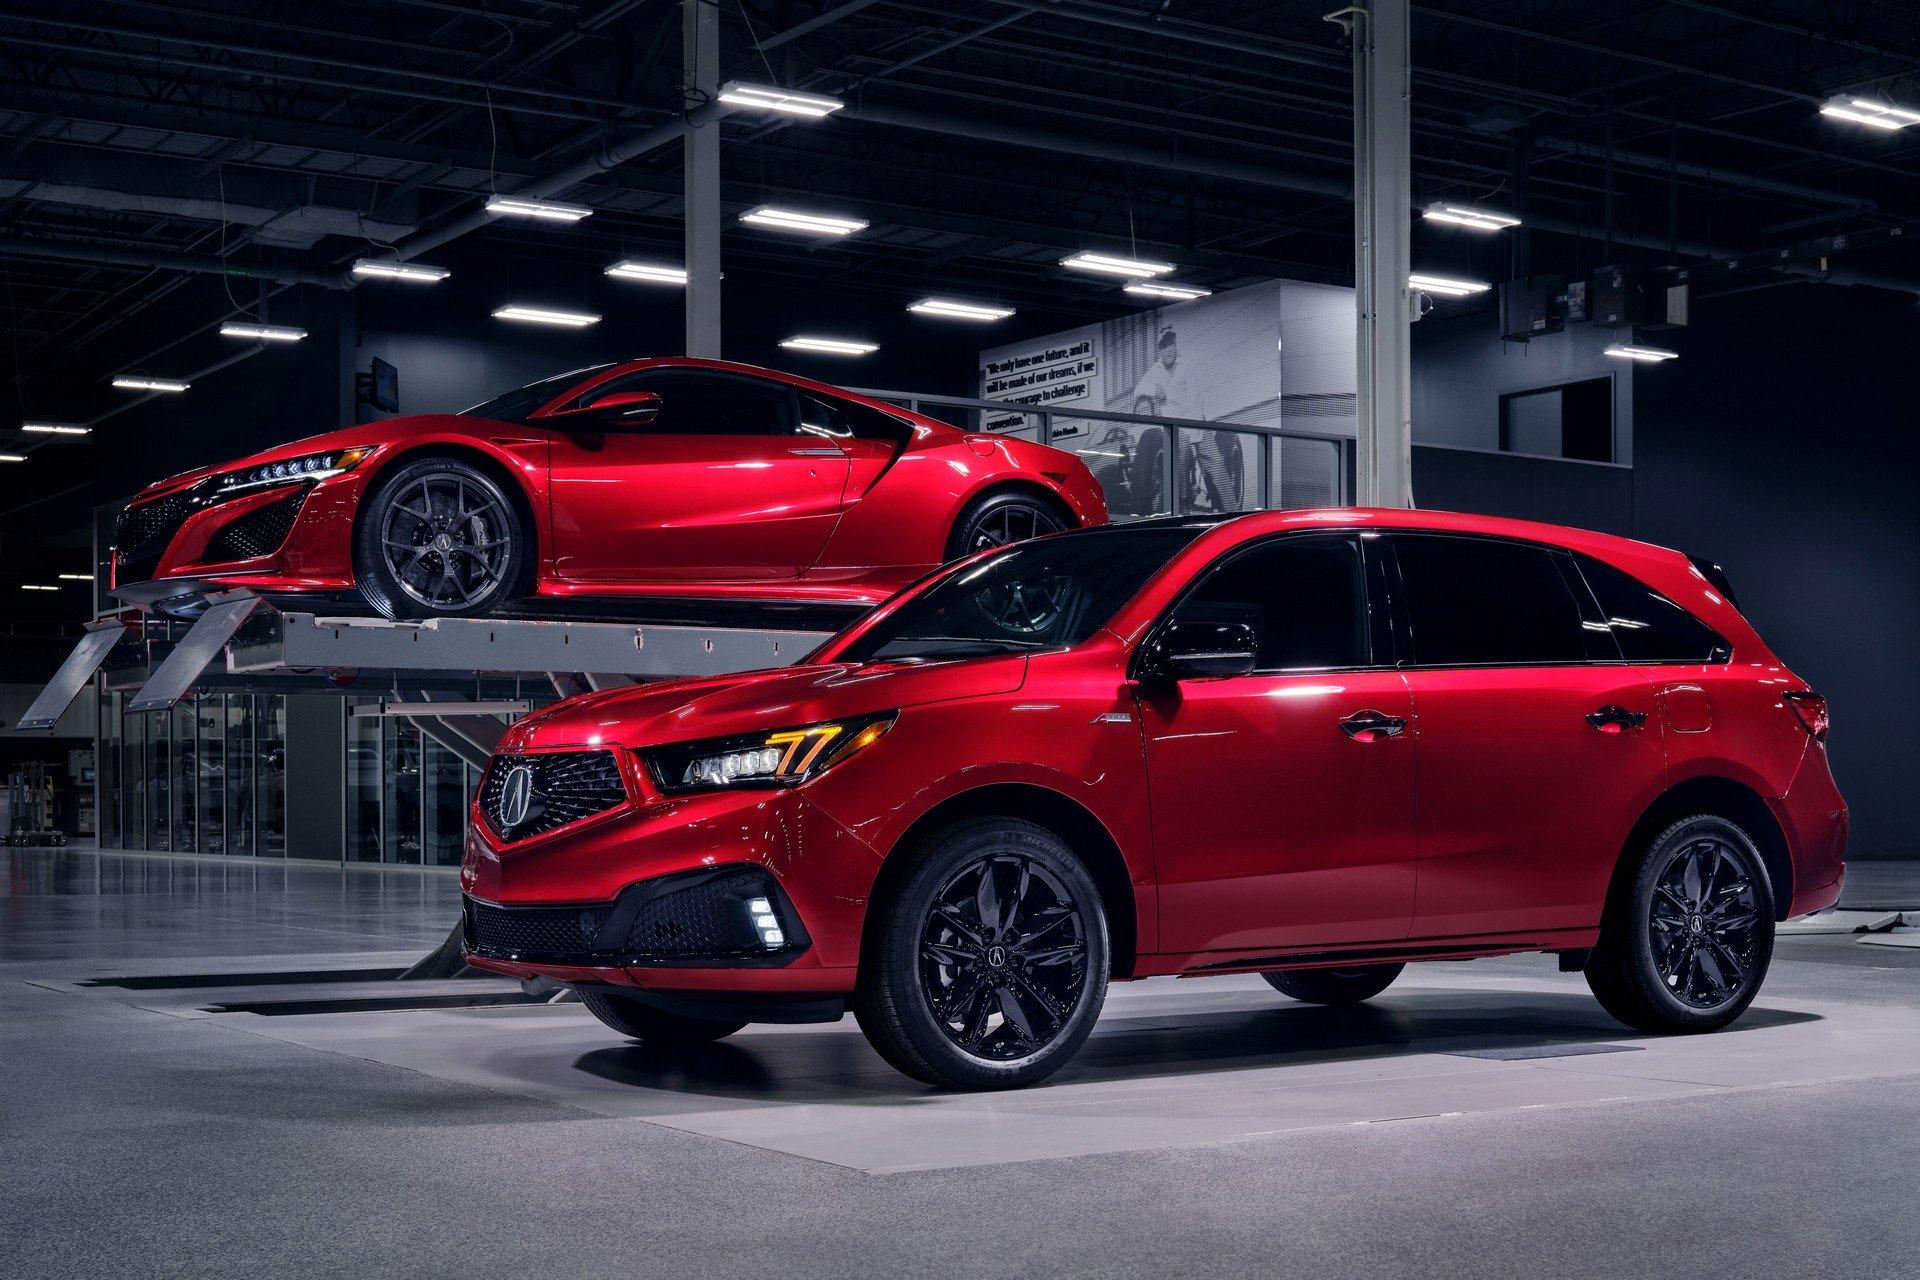 Acura-MDX-PMC-Edition-3